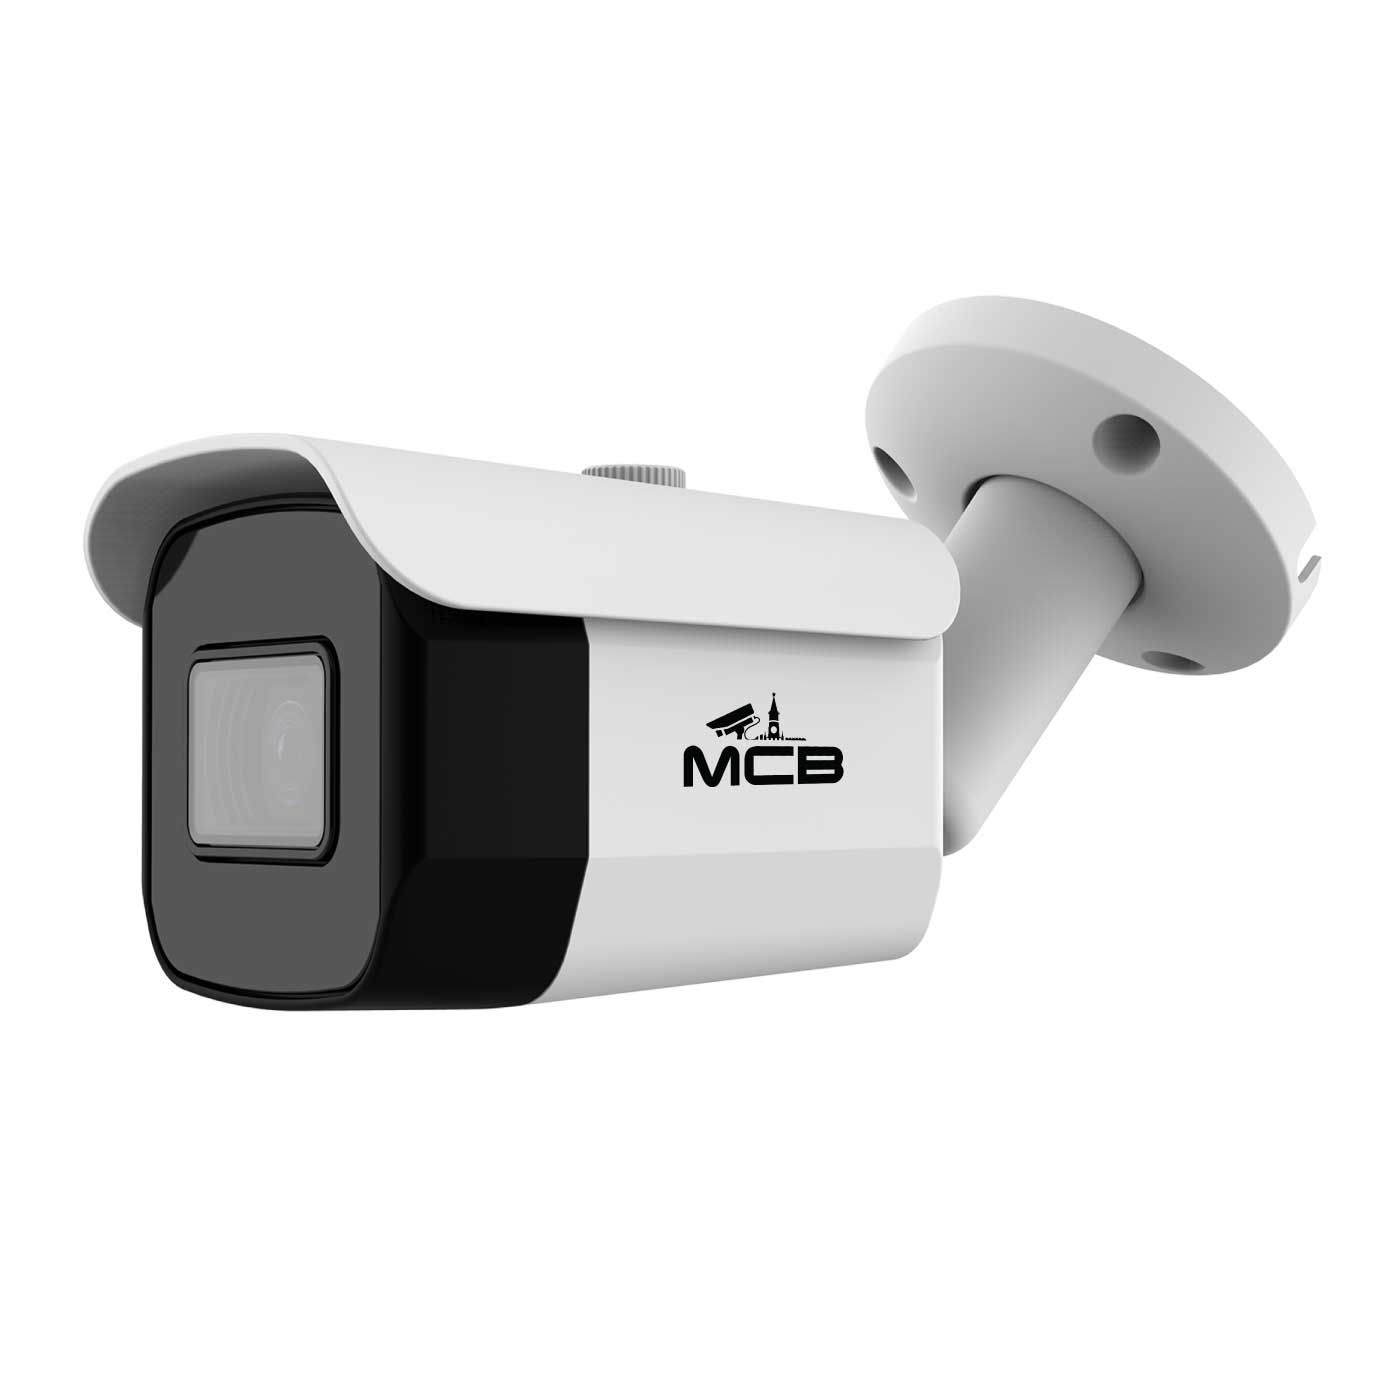 Уличная IP камера, 8 Мп (3840*2160), ИК-подсветка 40 м, Обзор 110°, POE